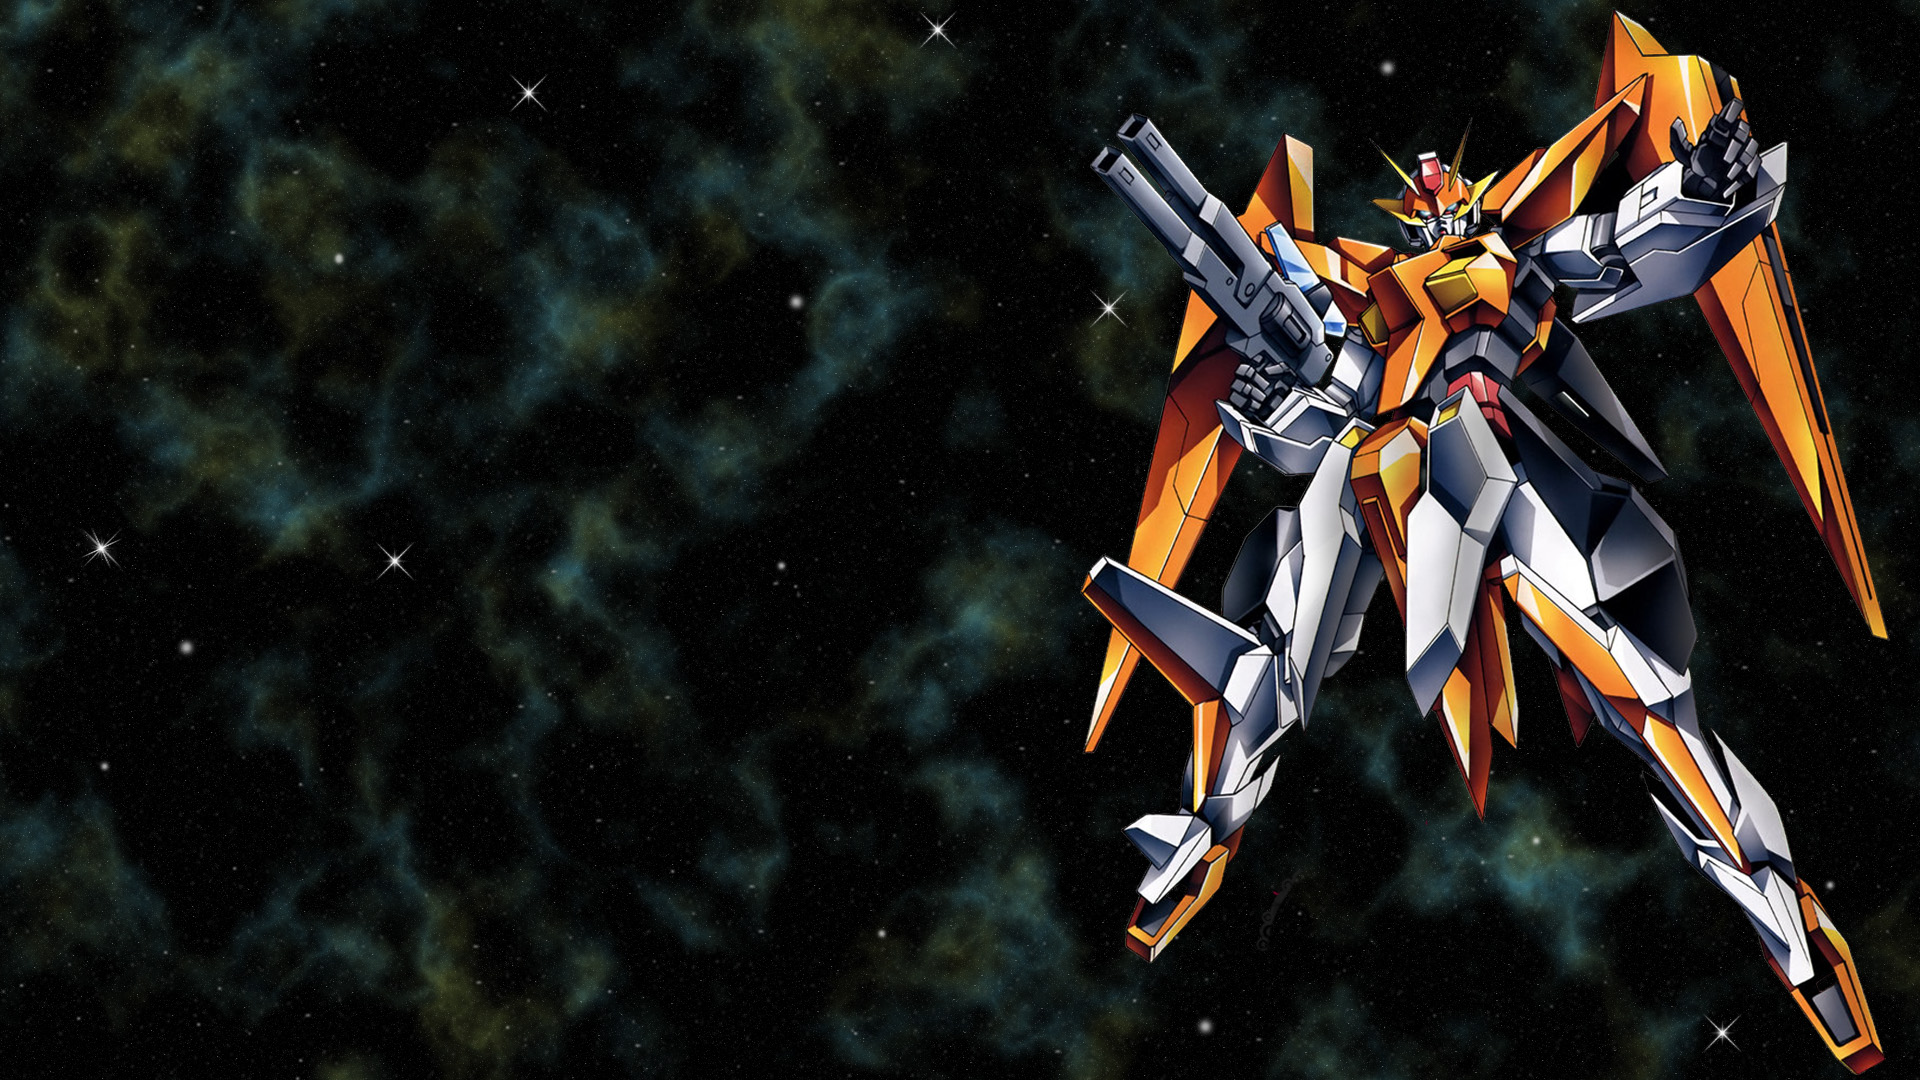 Cool Fire Gundam Anime Wallpapers HD 1920x1080